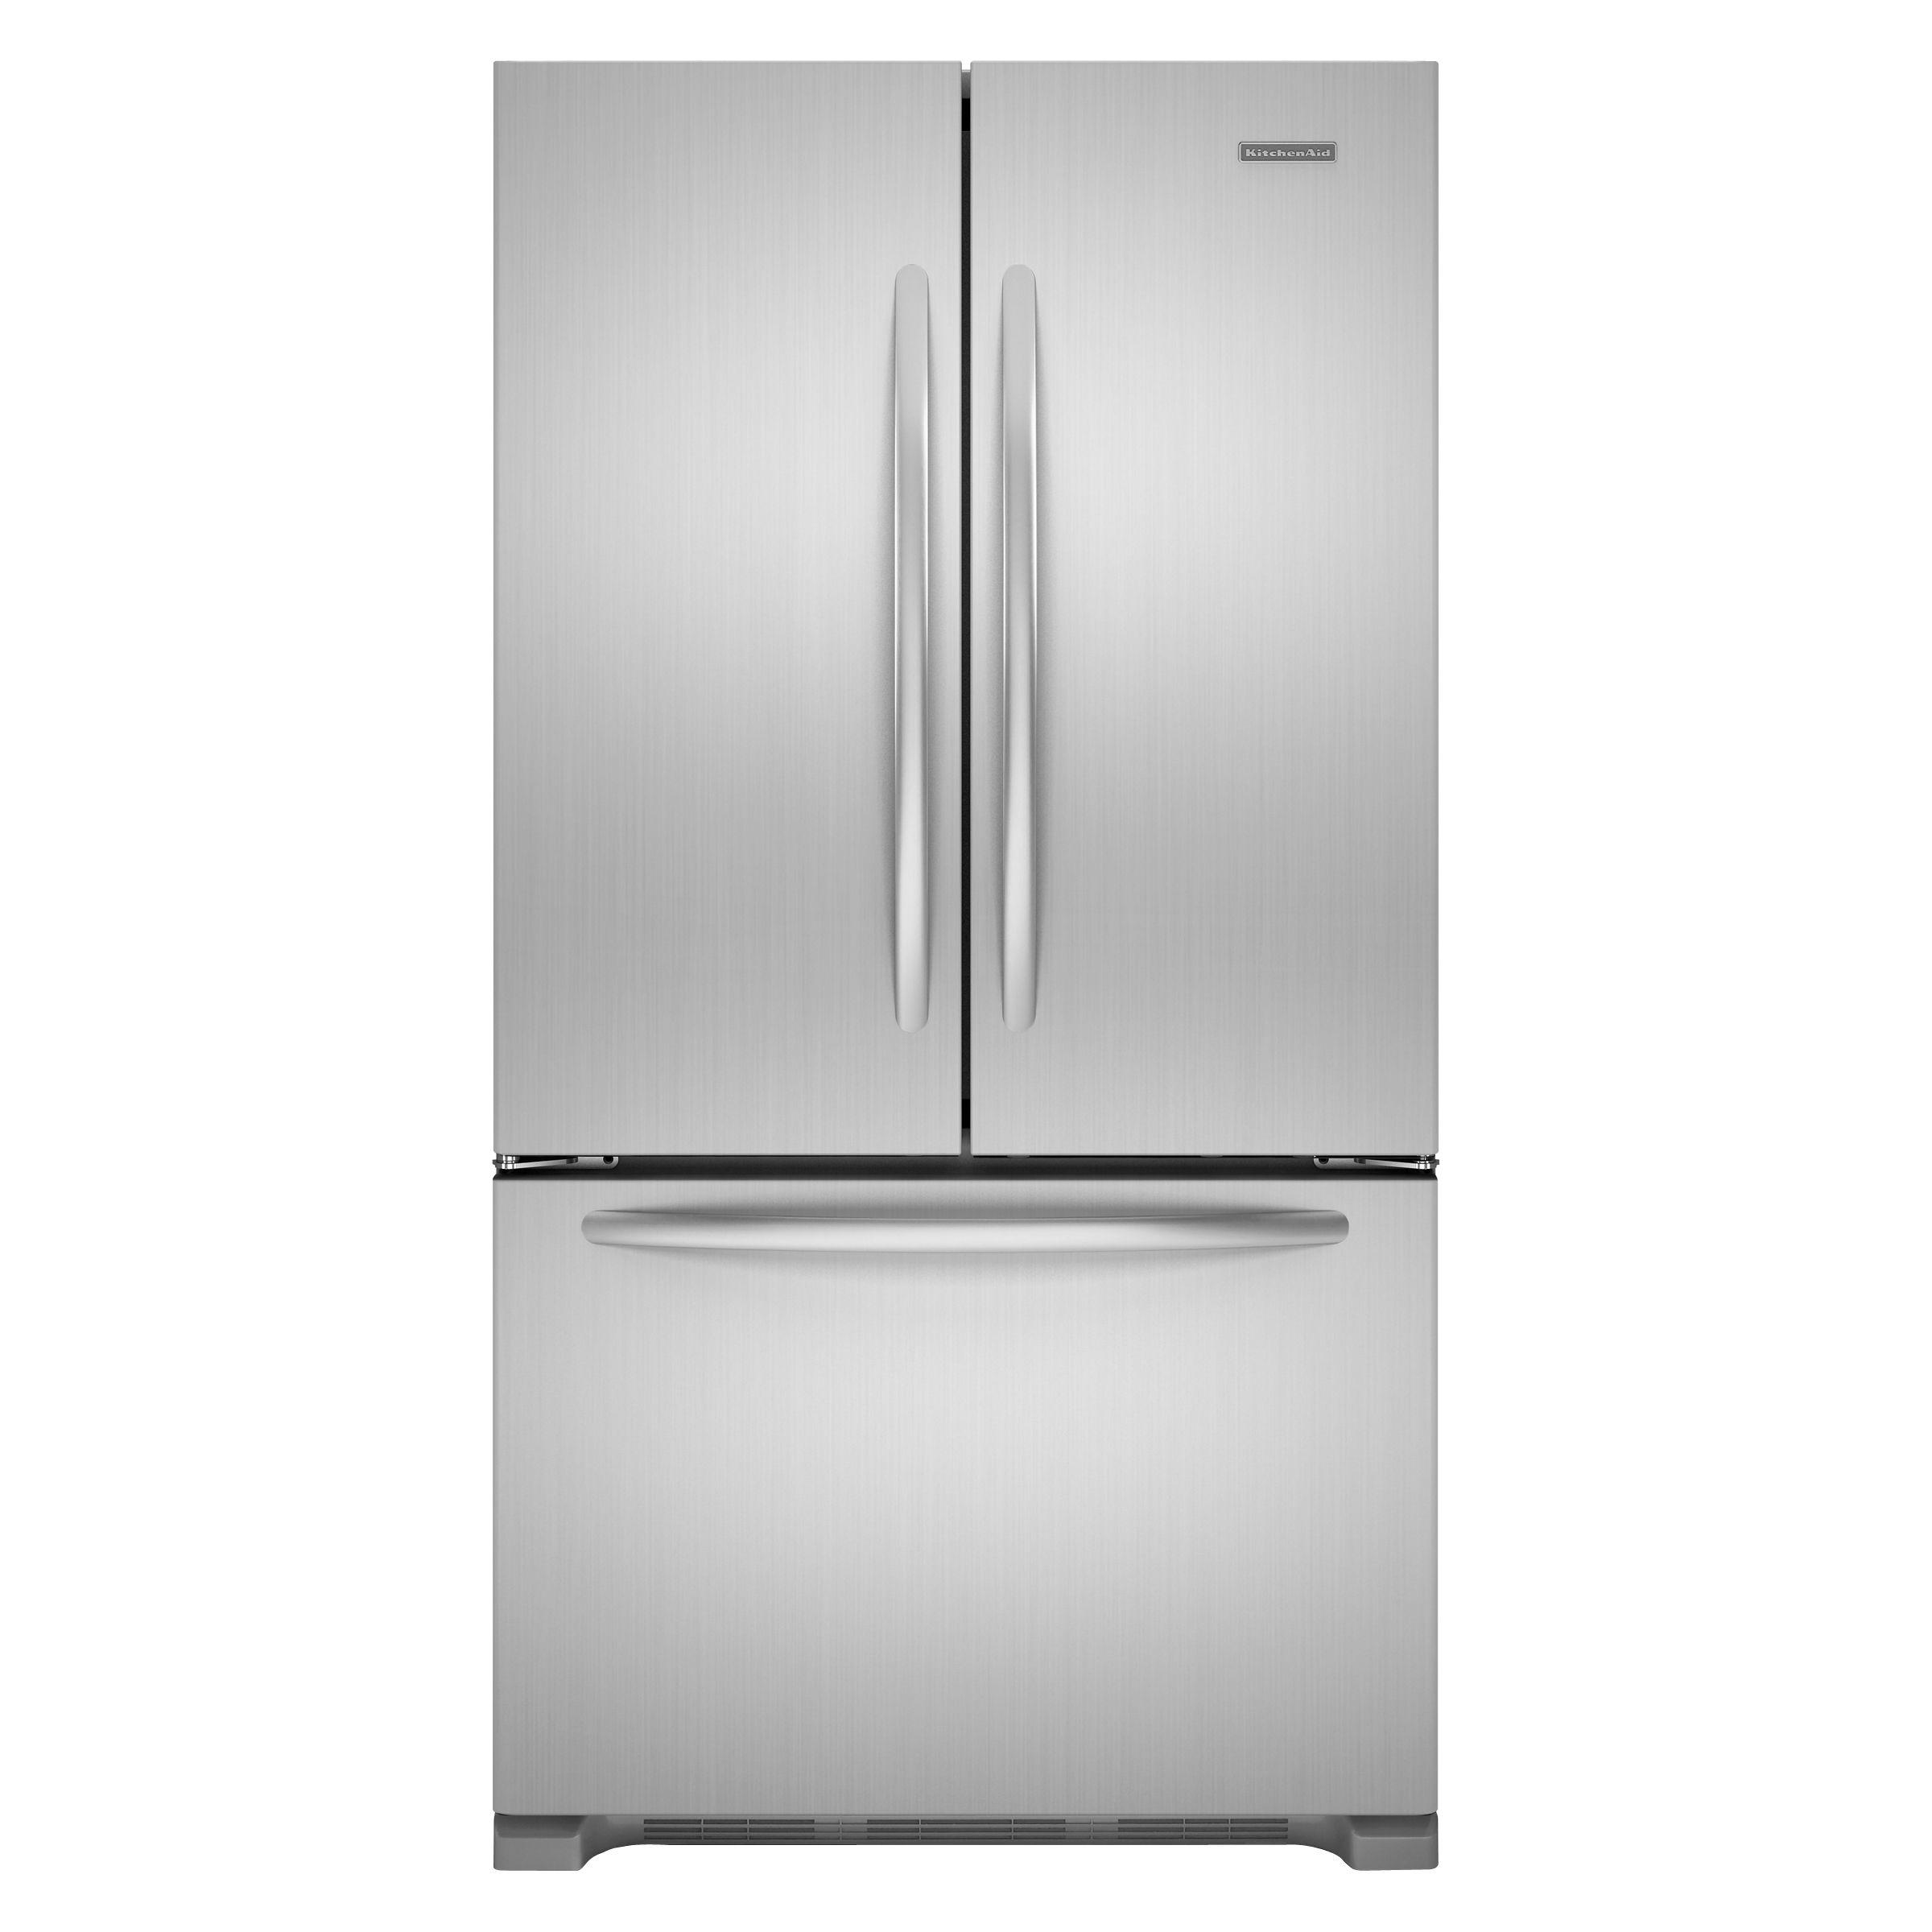 kitchenaid refrigerator model kfcs22evms manual